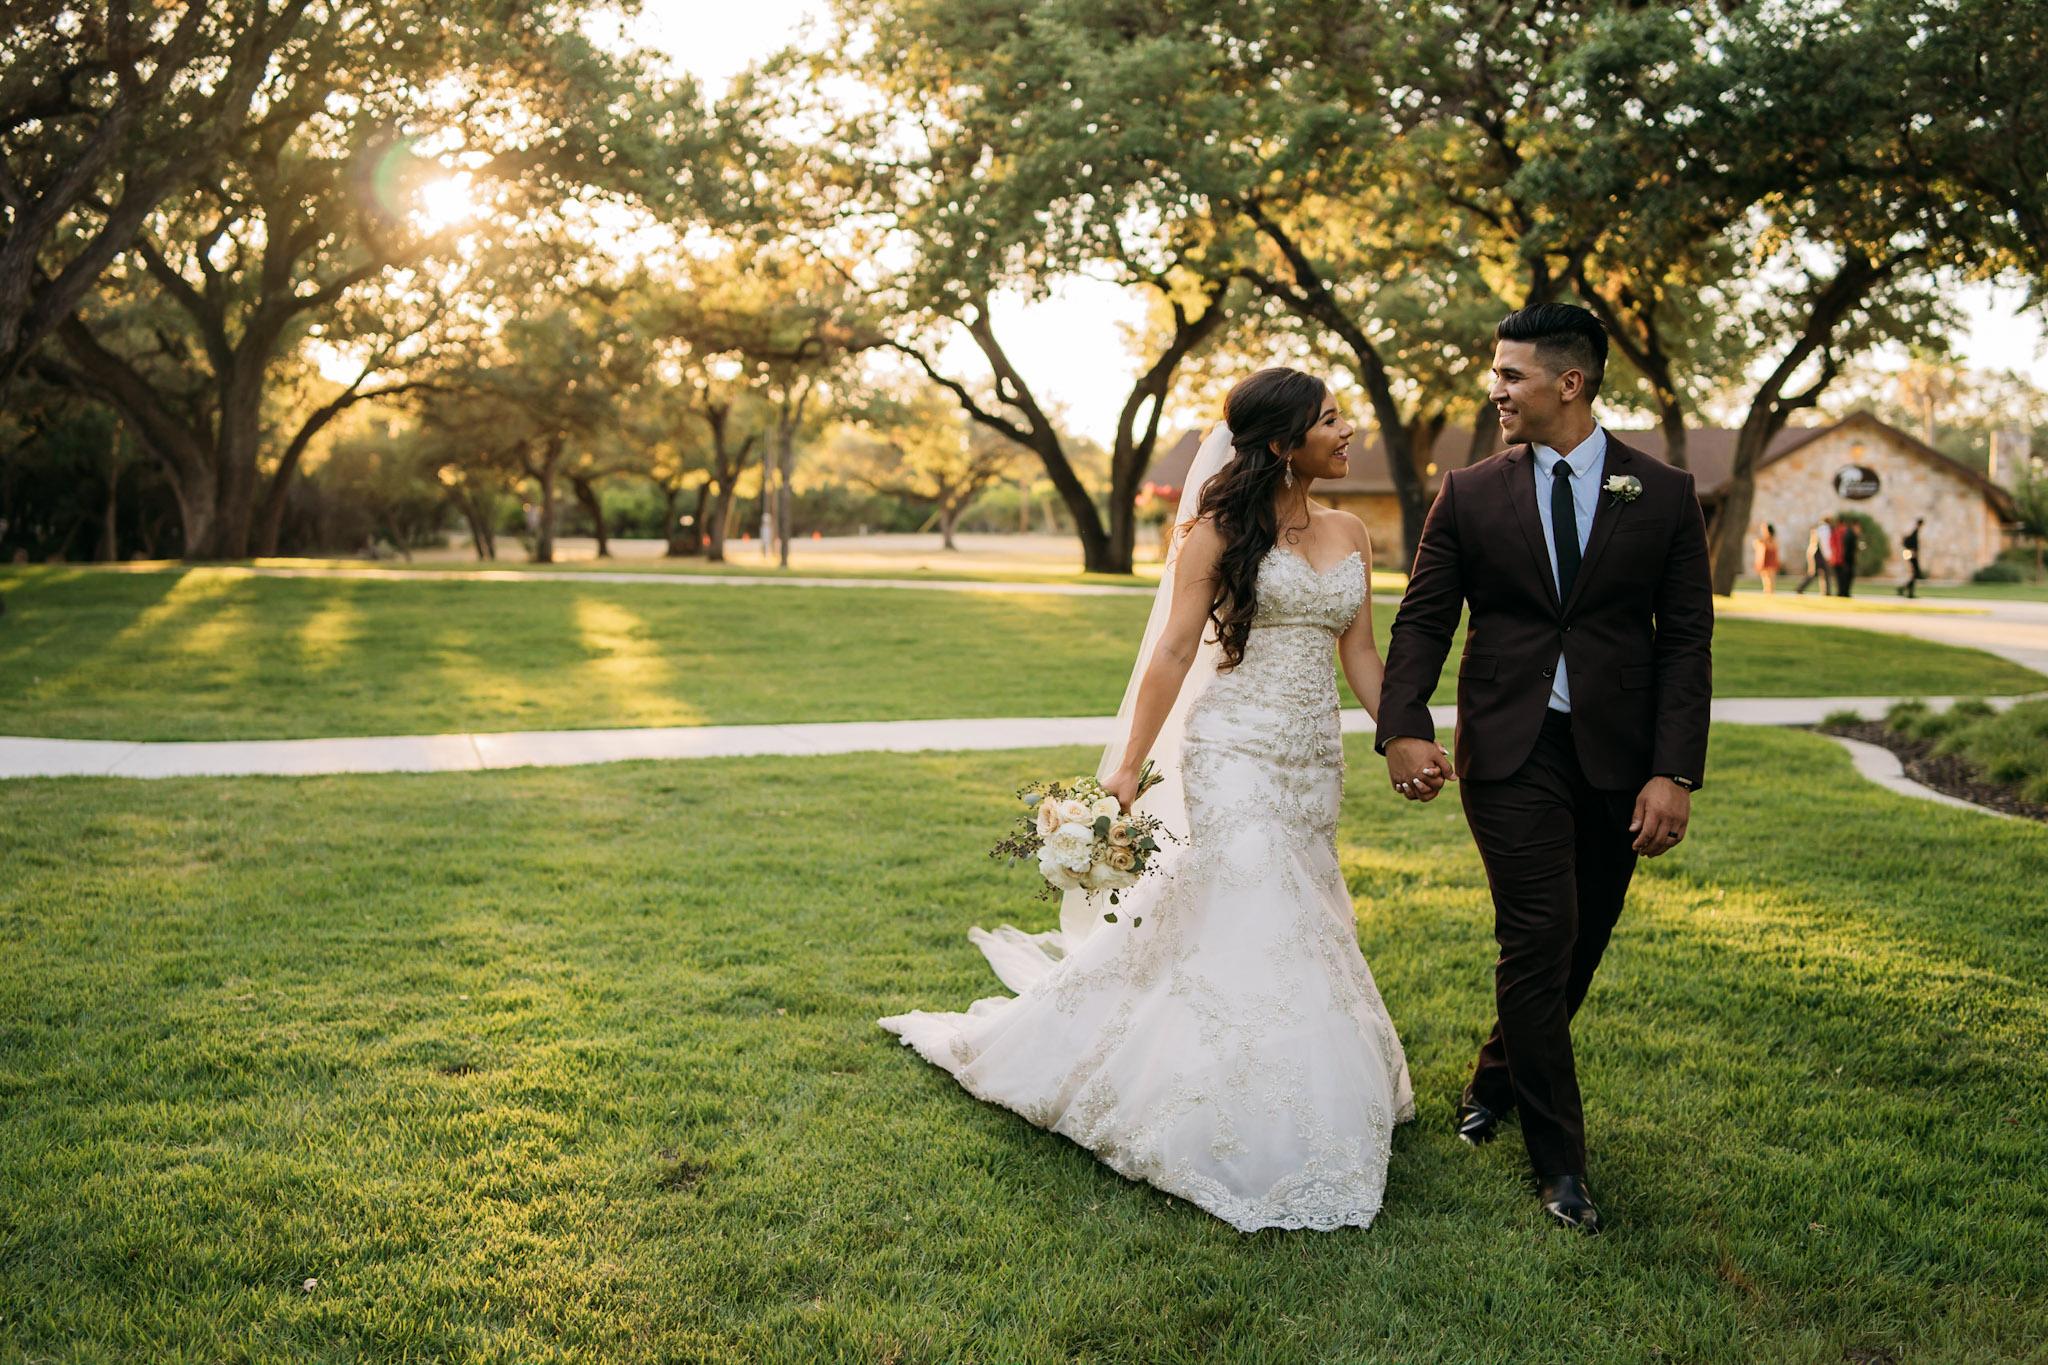 060718-A-JoeDel-Wedding-AdrianRGarcia-FOMAScine_AA98478.jpg